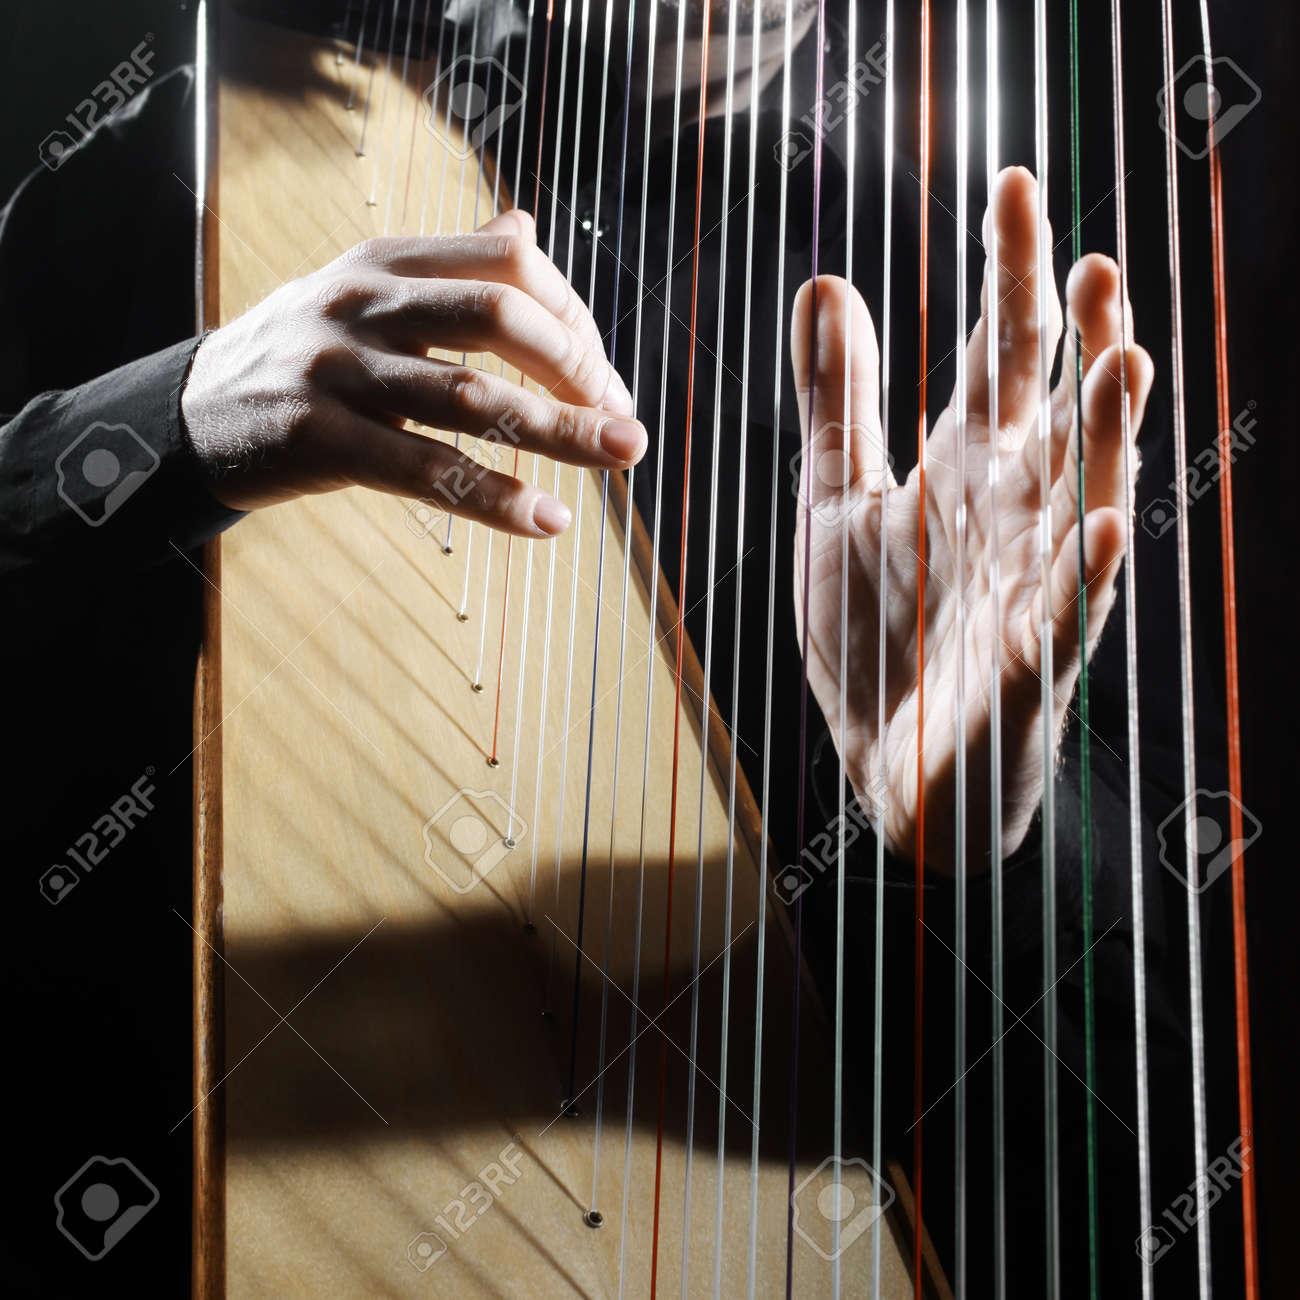 Harp strings closeup hands. Harpist with Classical Music Instrument Standard-Bild - 42119747